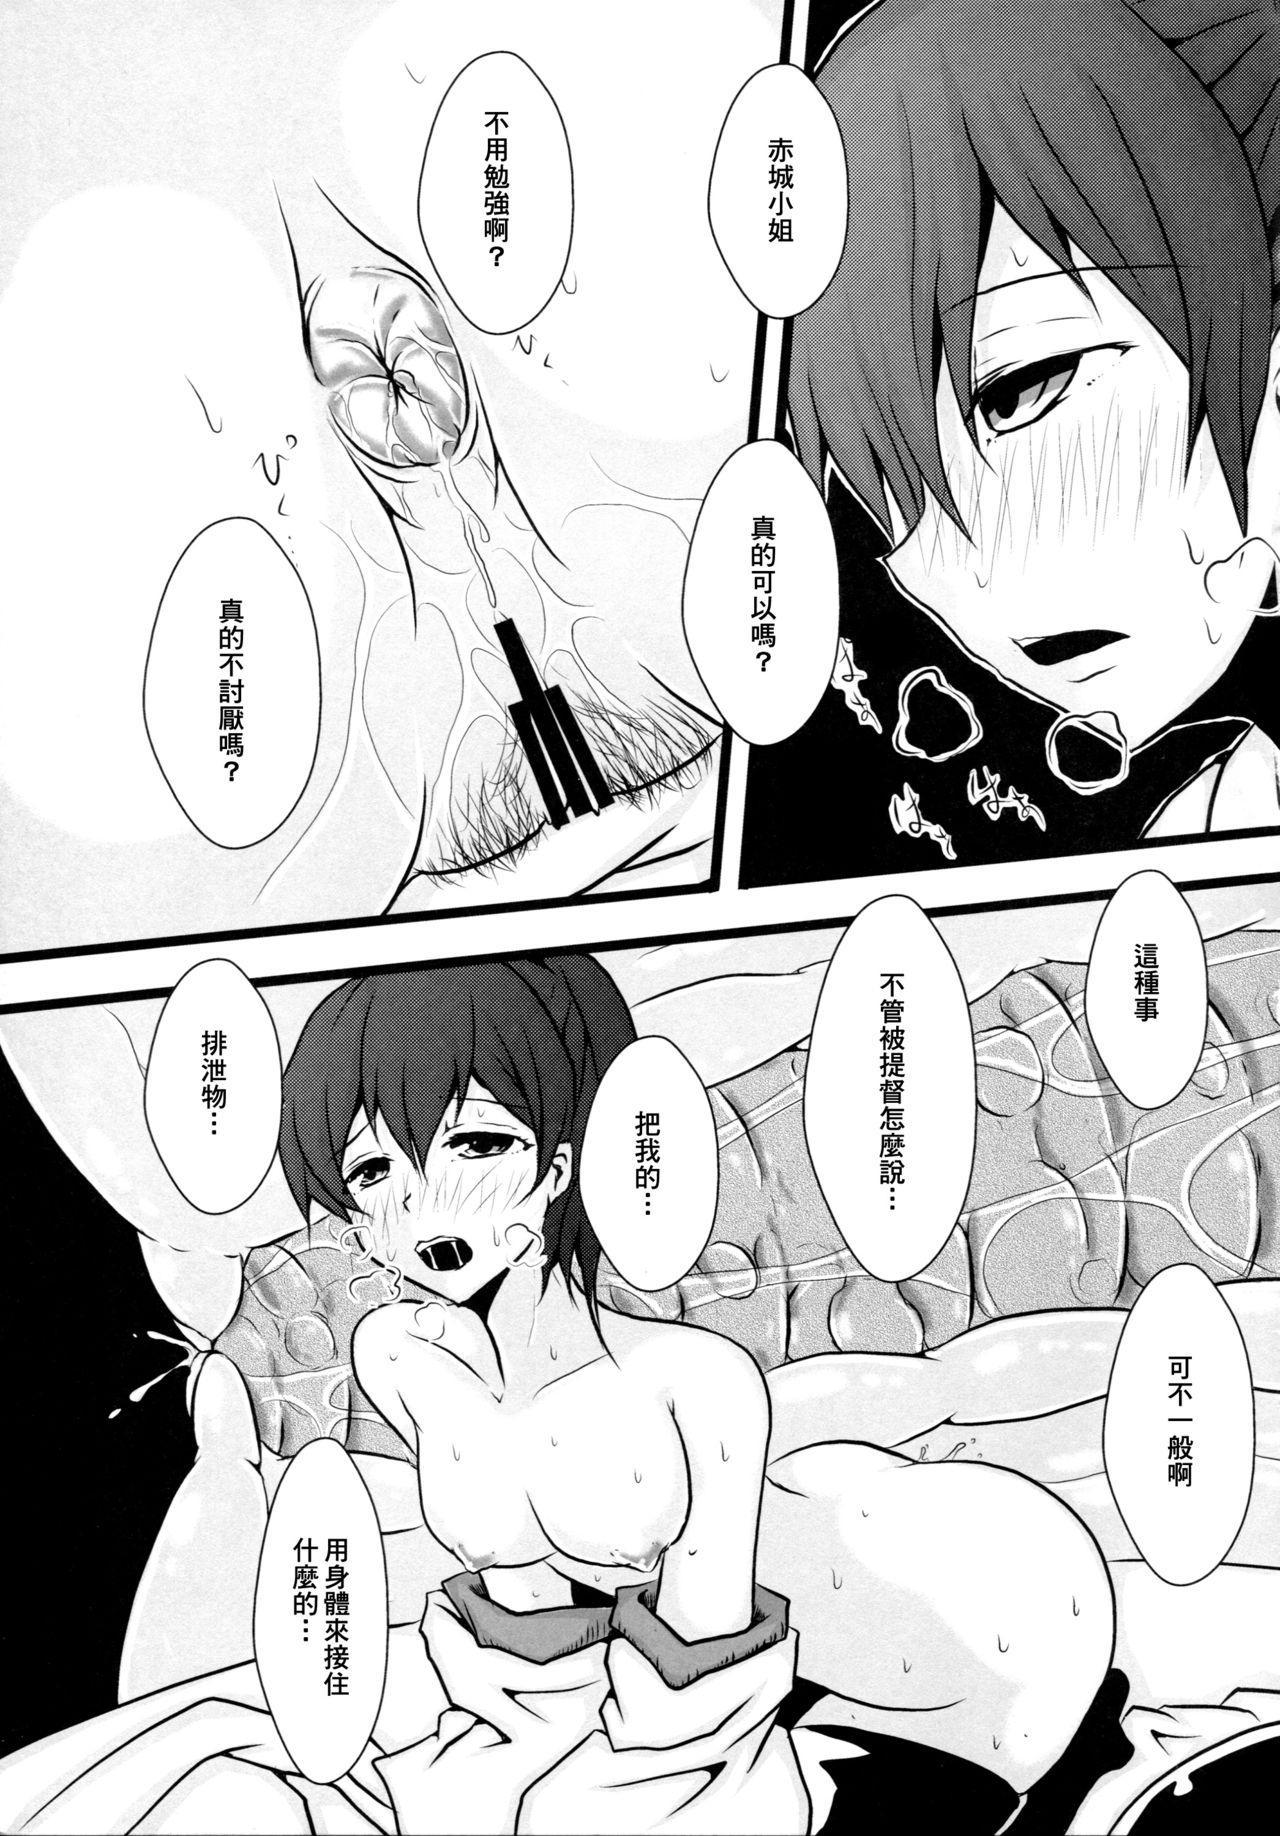 KanColle Haisetsu Sex Goudoushi LoveSca! Goudou Enshuu!! | 艦C排泄性交合同誌 激情糞便! 聯合演習!! 62